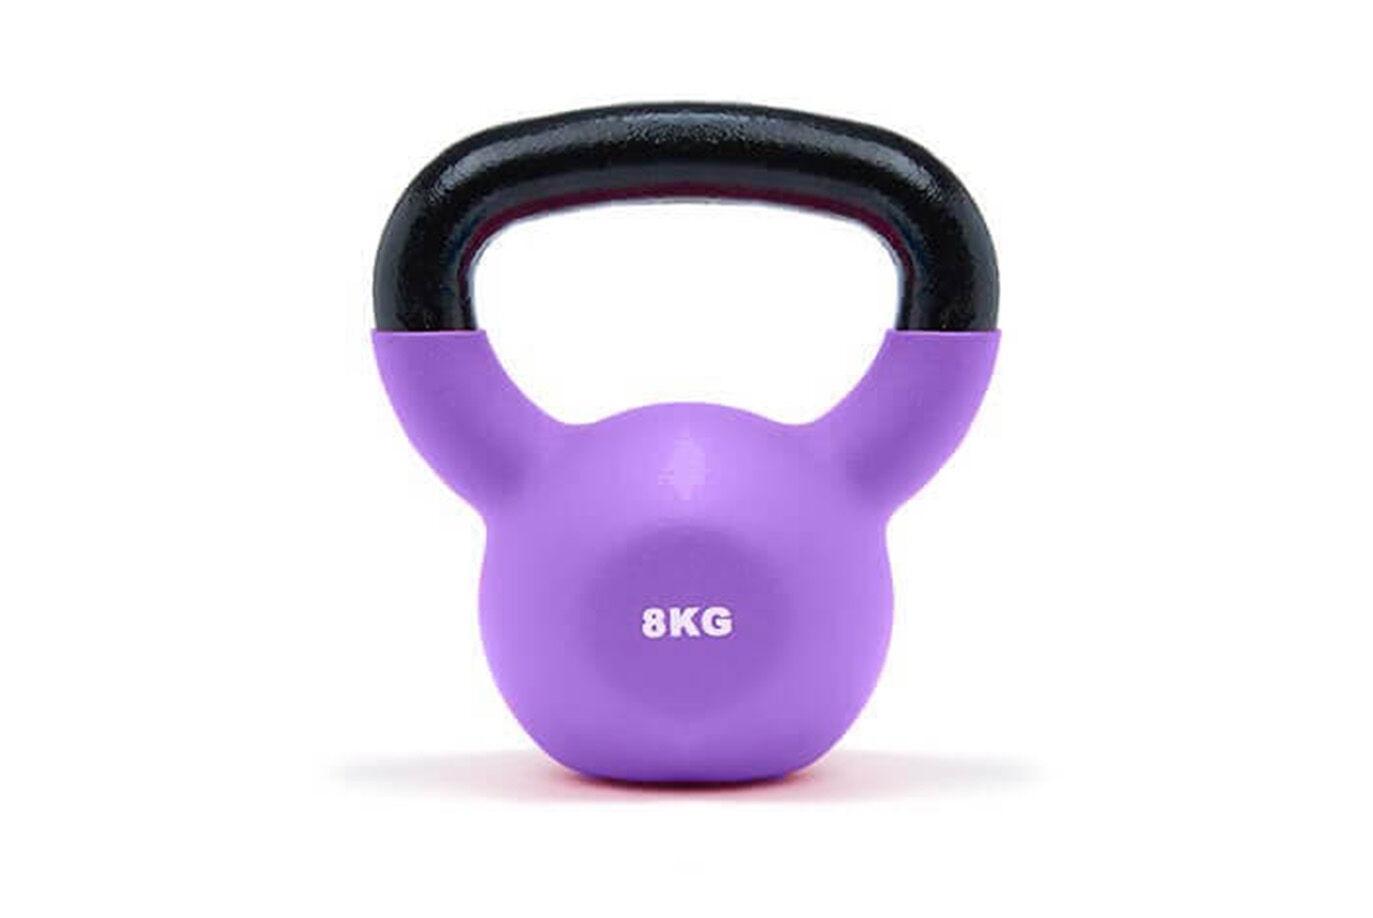 8kg Kettlebell by JTX Fitness